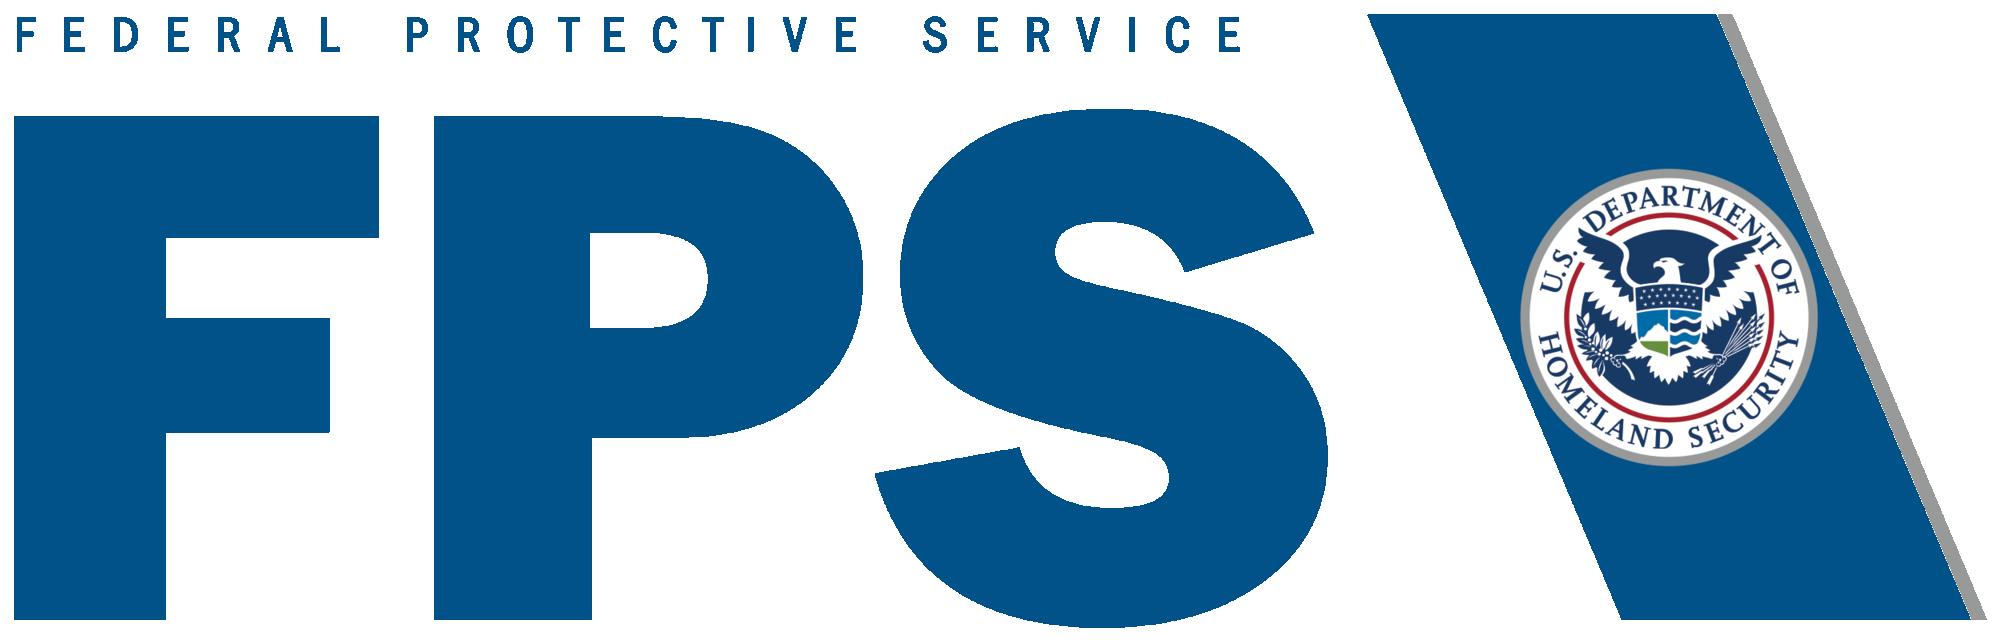 Federal Protective Service logo